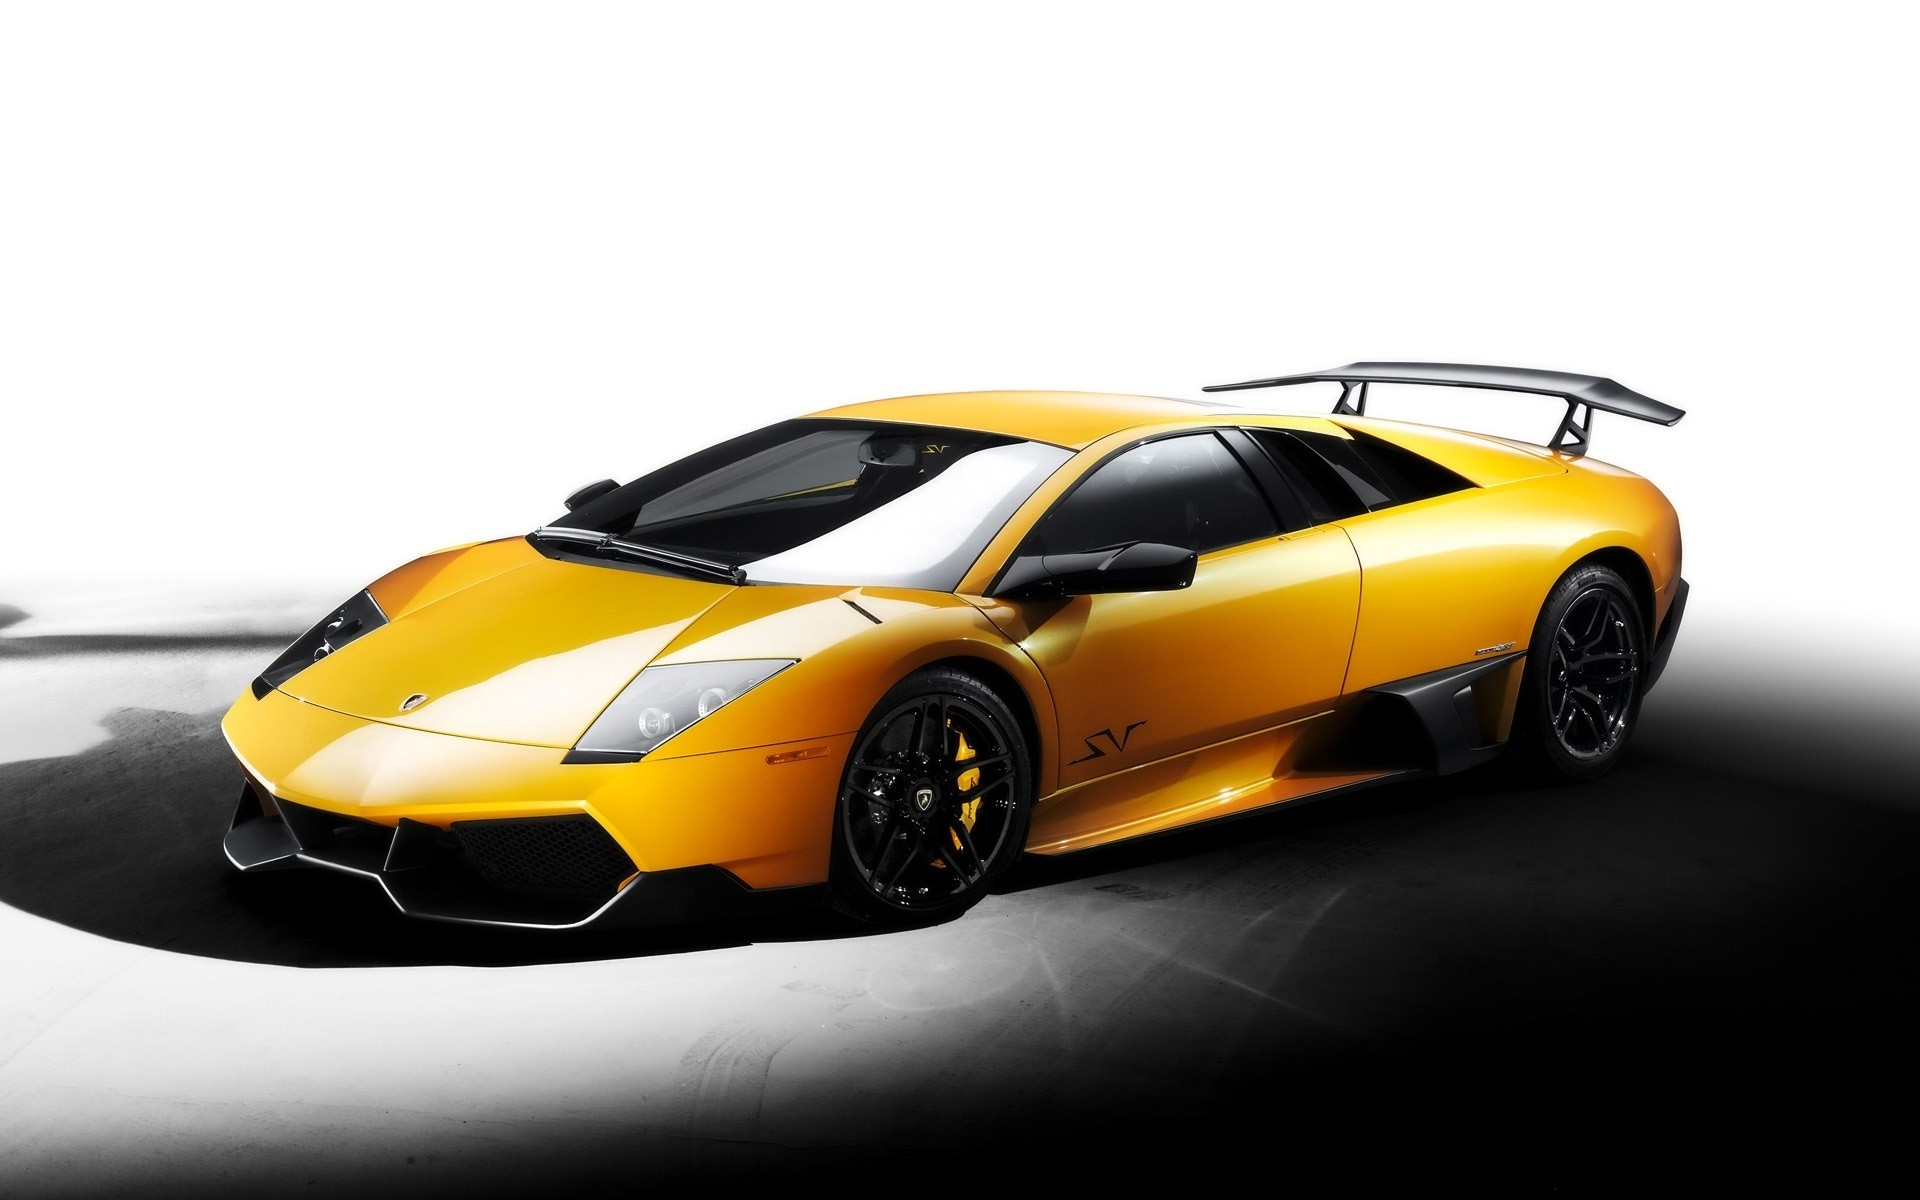 Lamborghini Car Vehicle Wheel Transportation System Fast Blacktop Hurry  Coupe Action Asphalt Lamborghini Murcielago